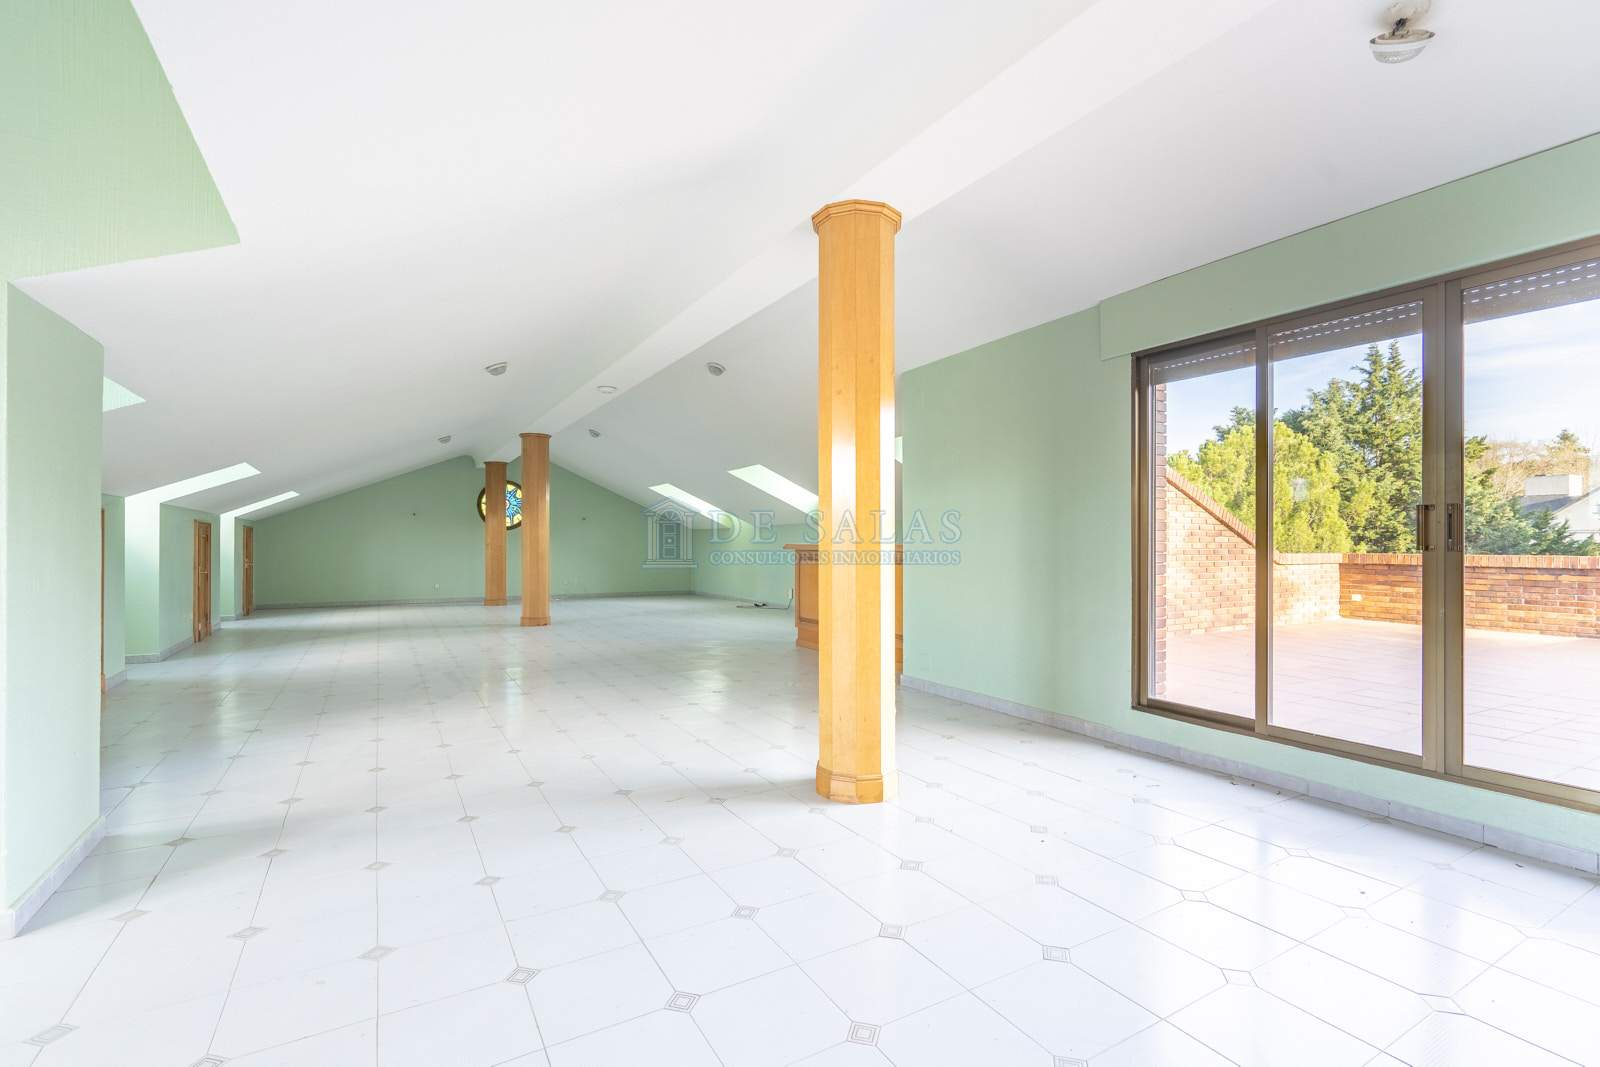 29-Sala  Chalet La Moraleja